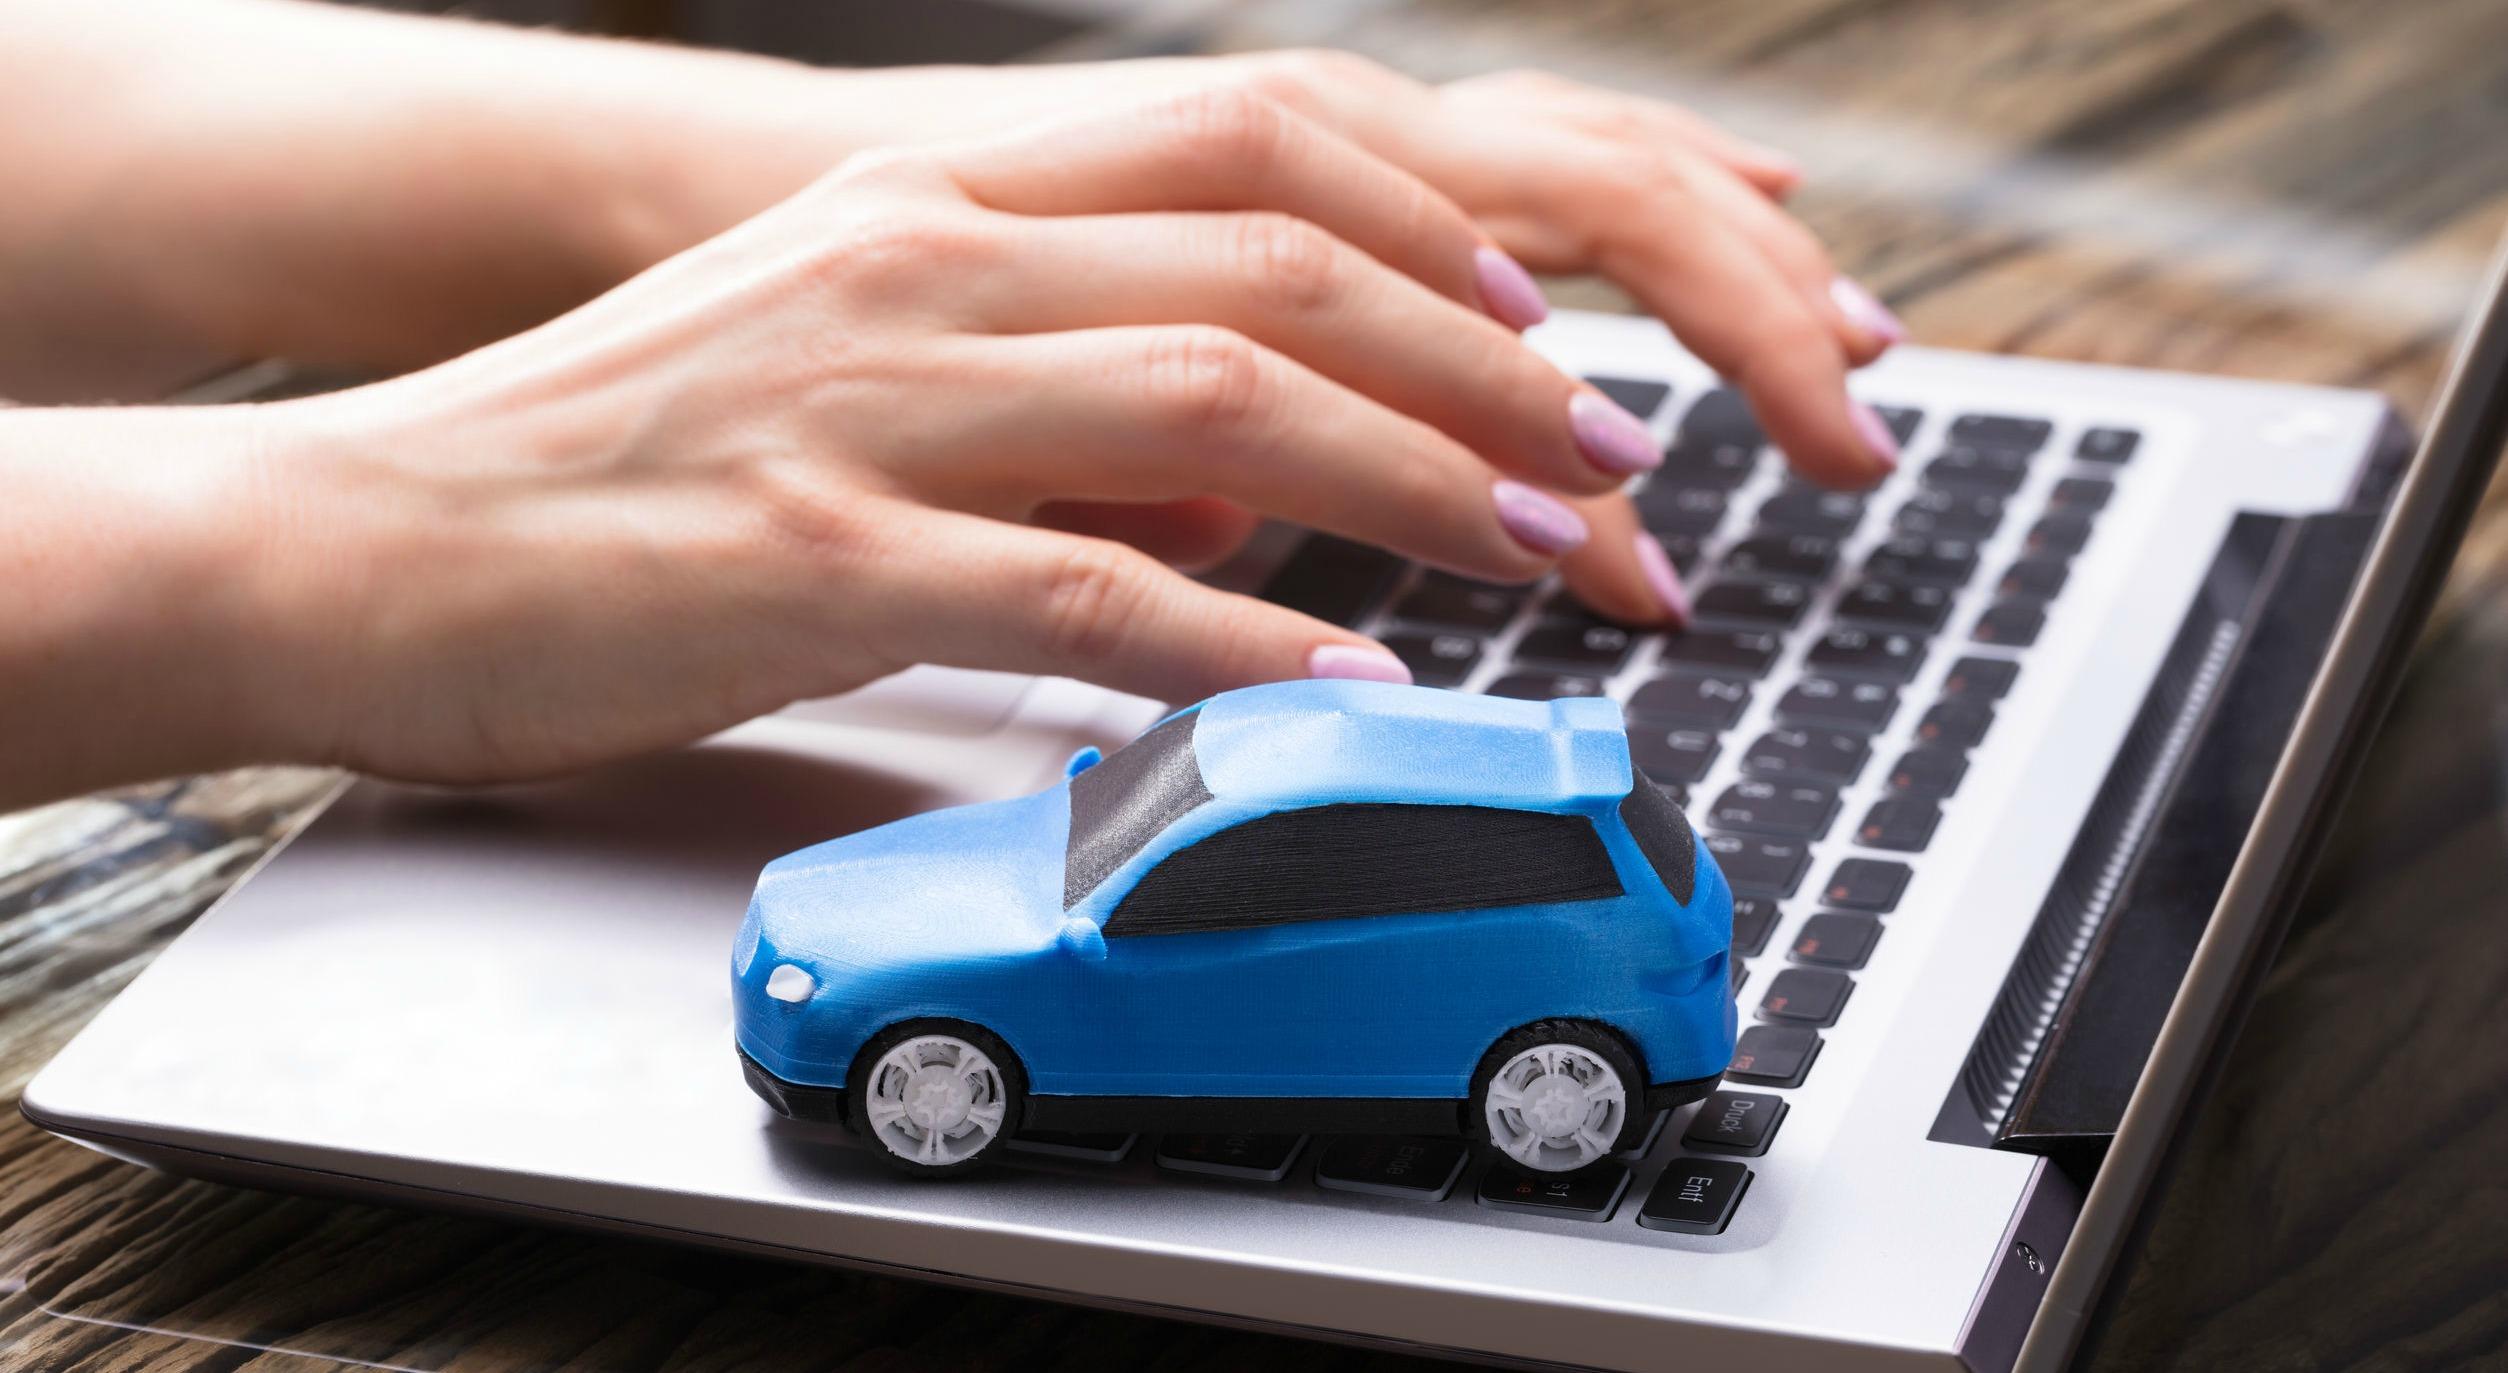 vendita auto usate on line internet